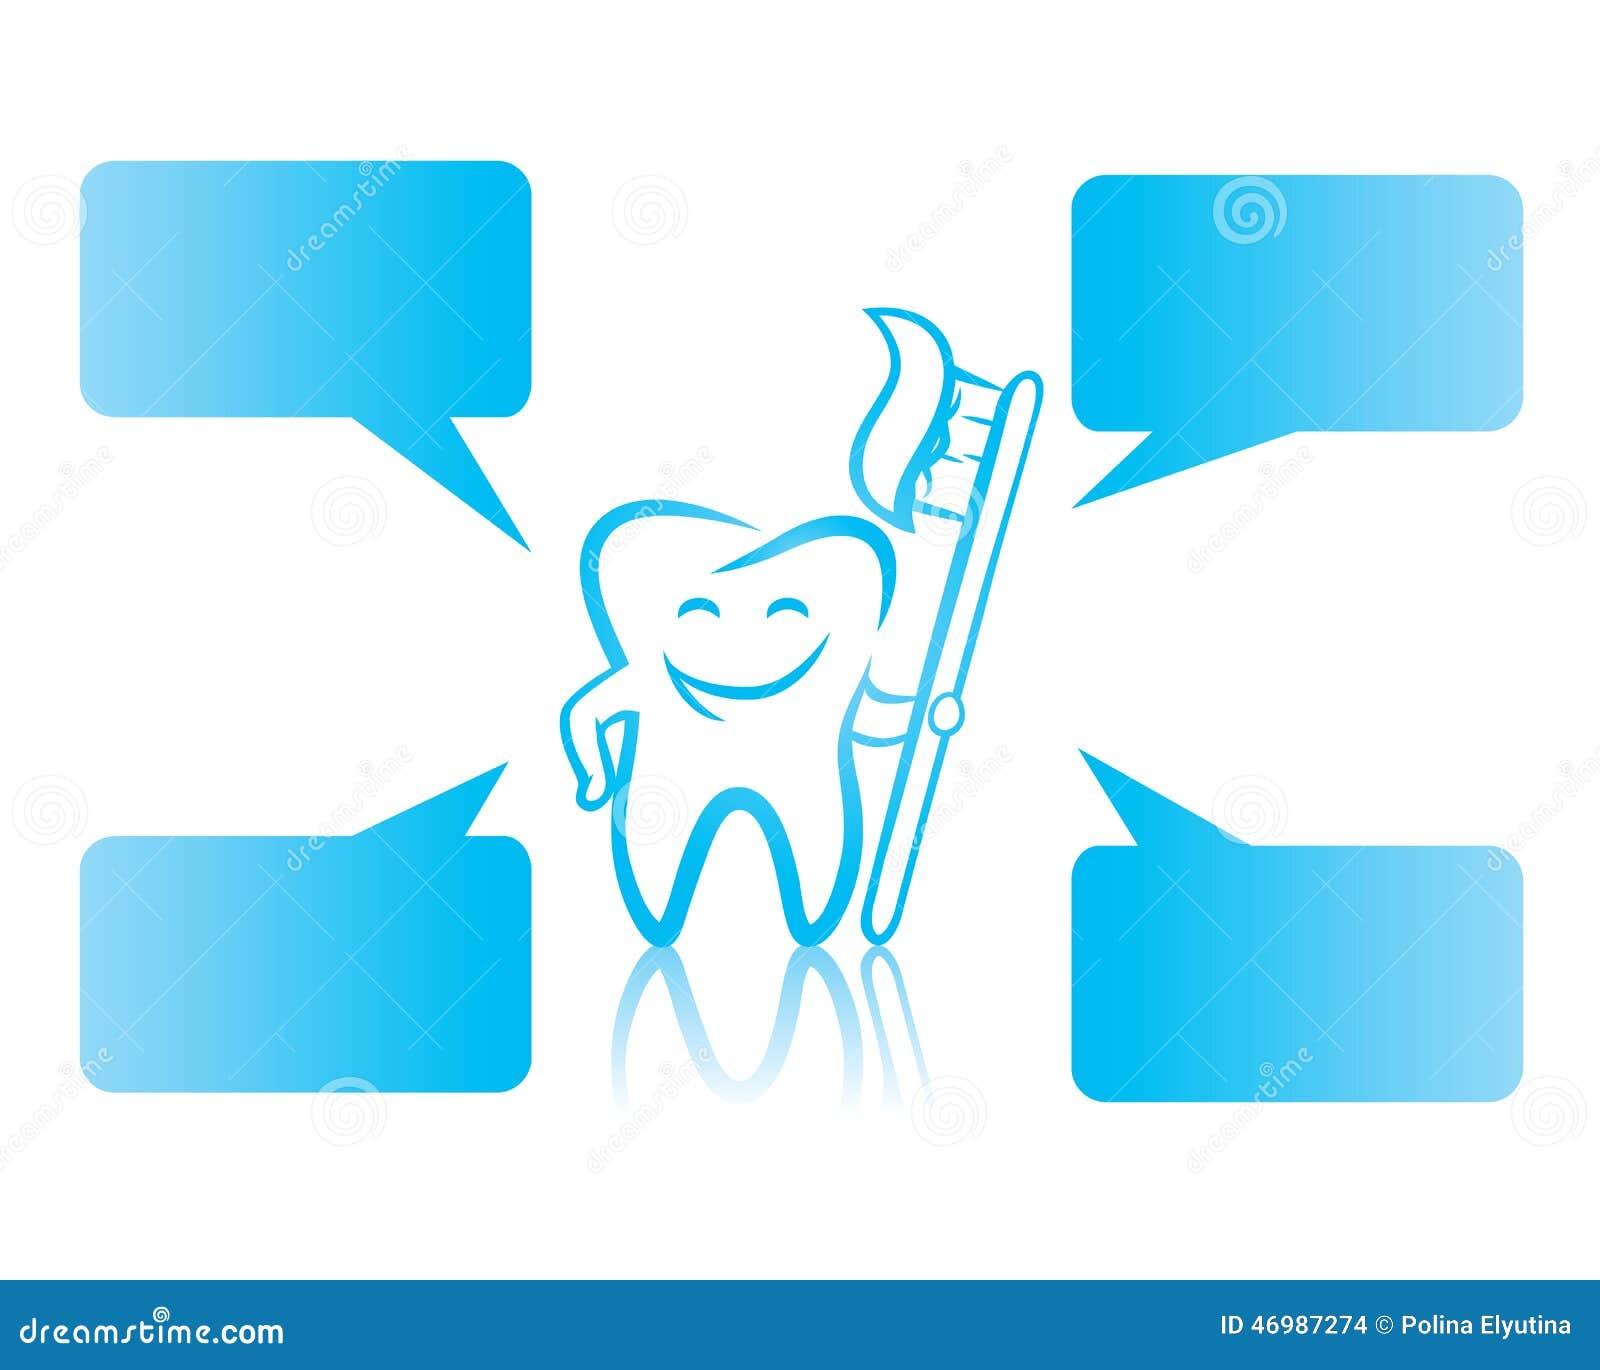 Toothbrush illustration